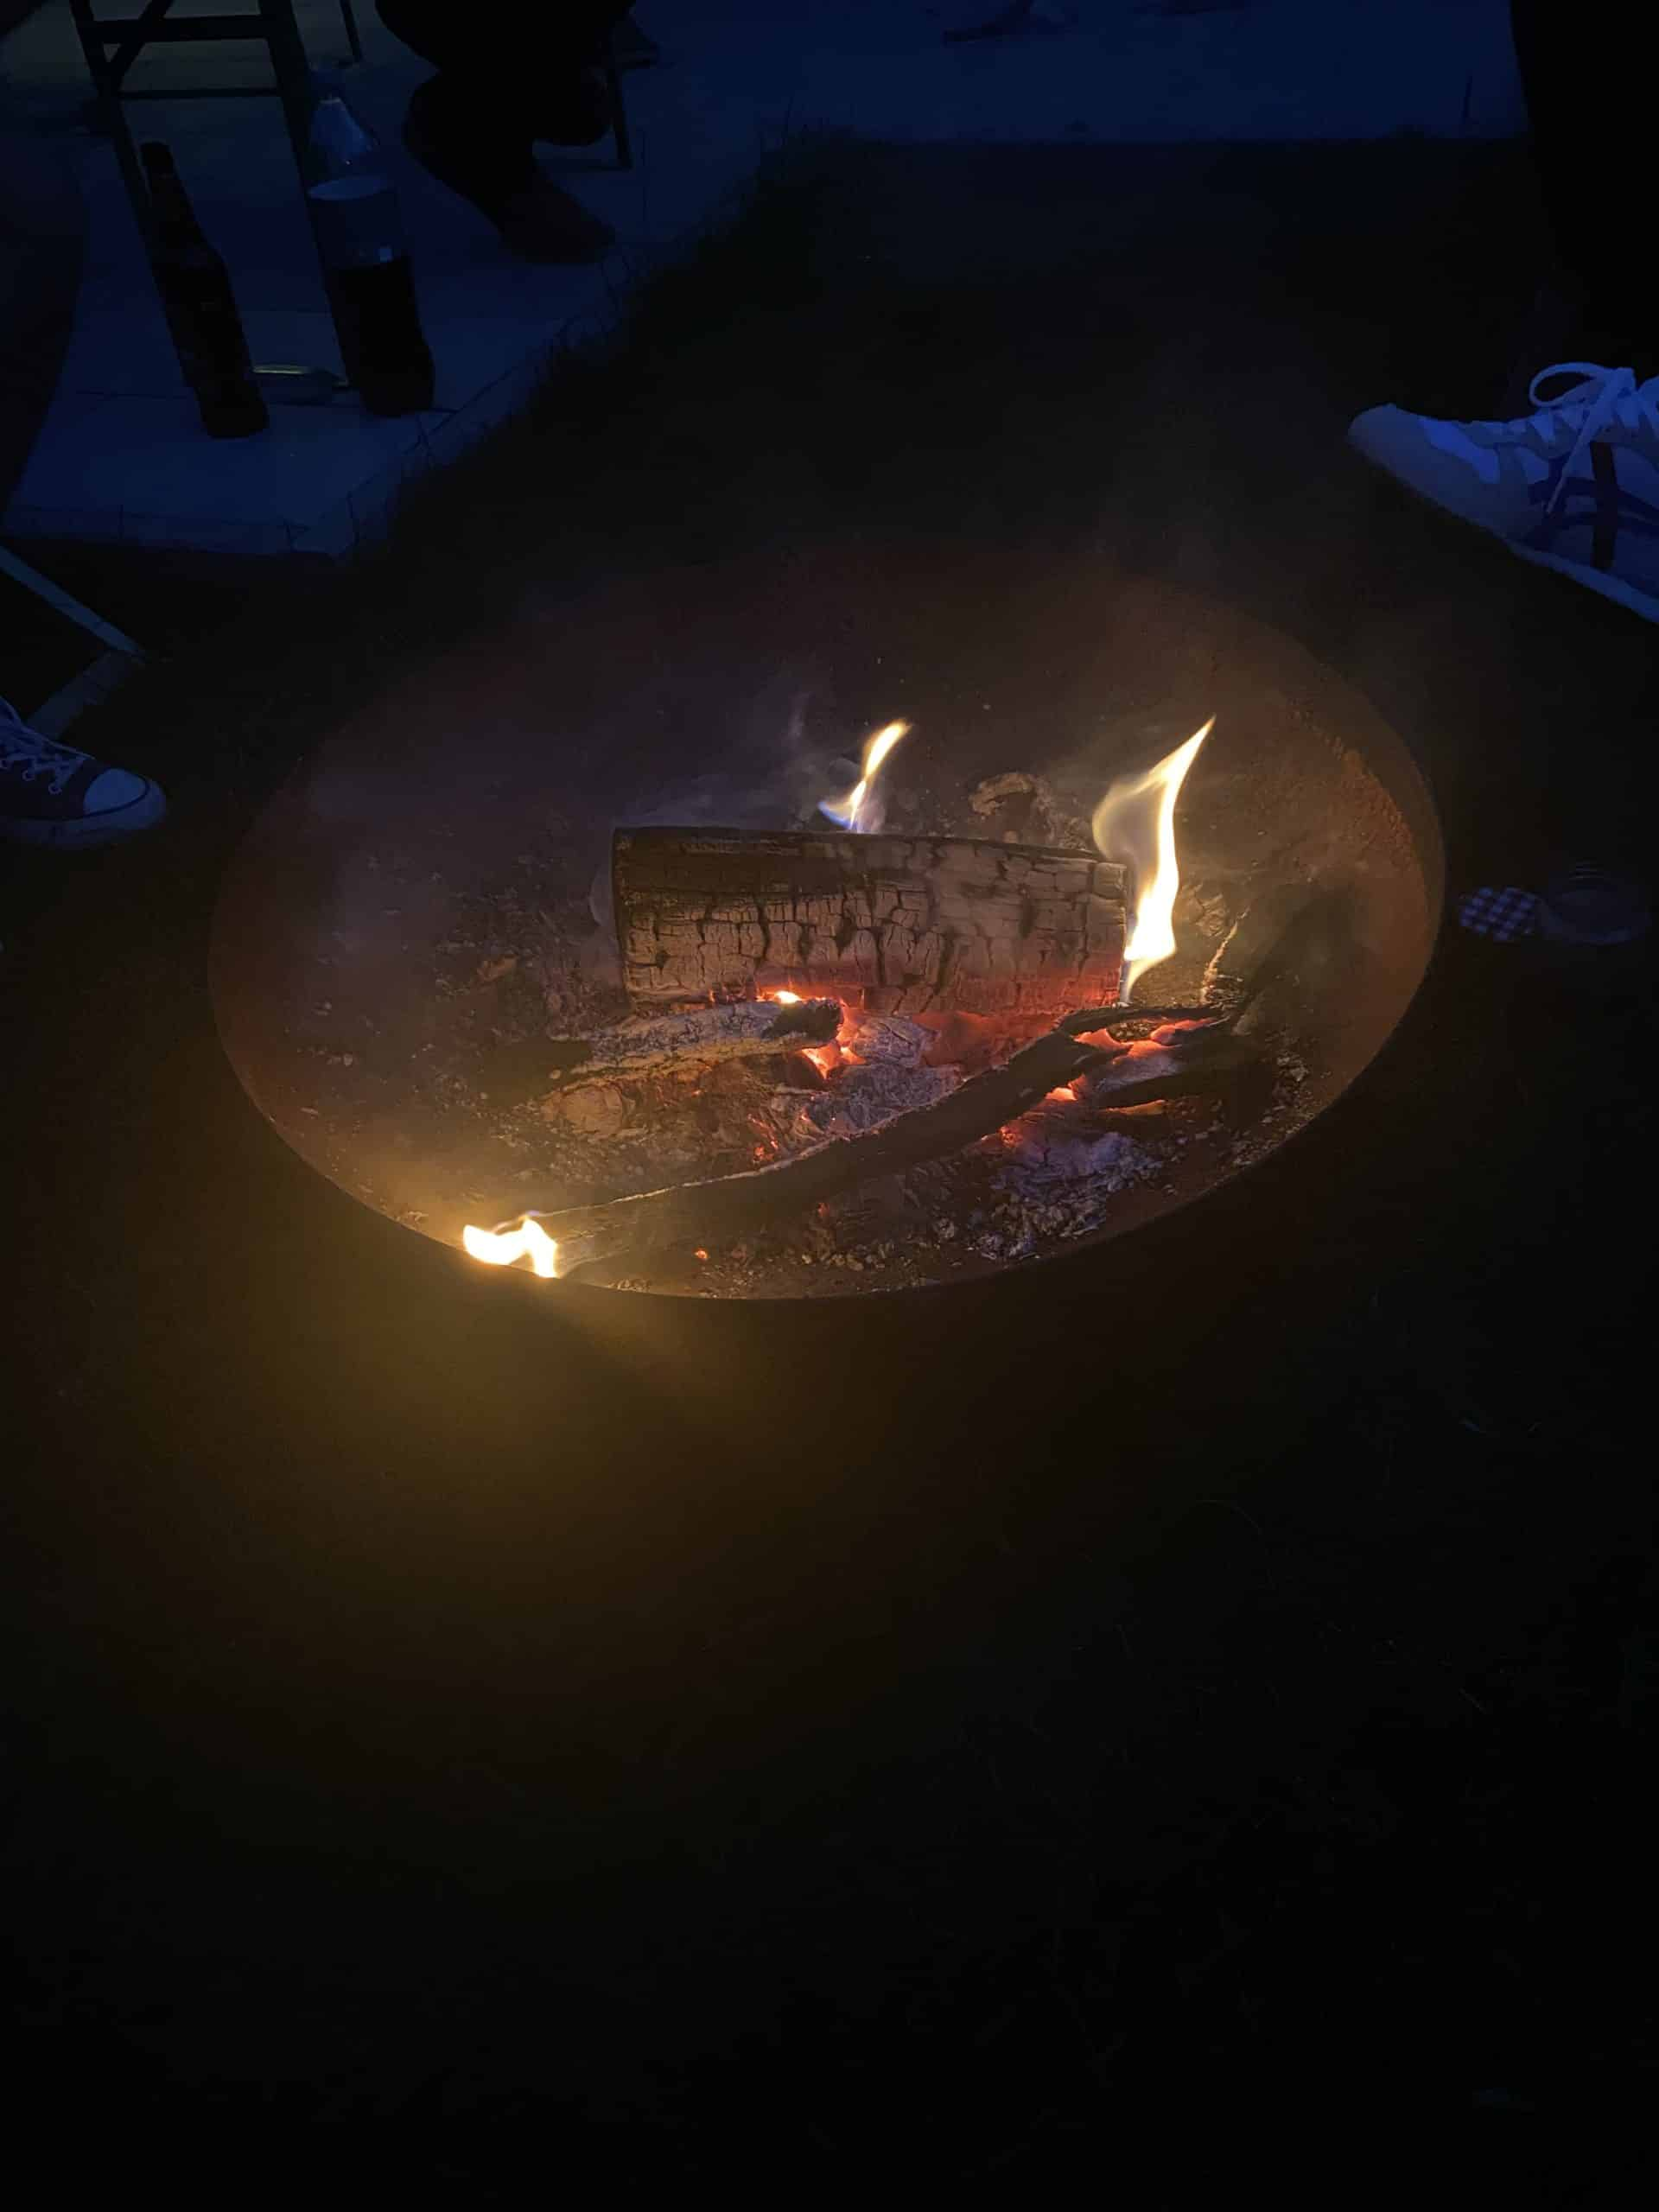 Feuerschale am Abend.